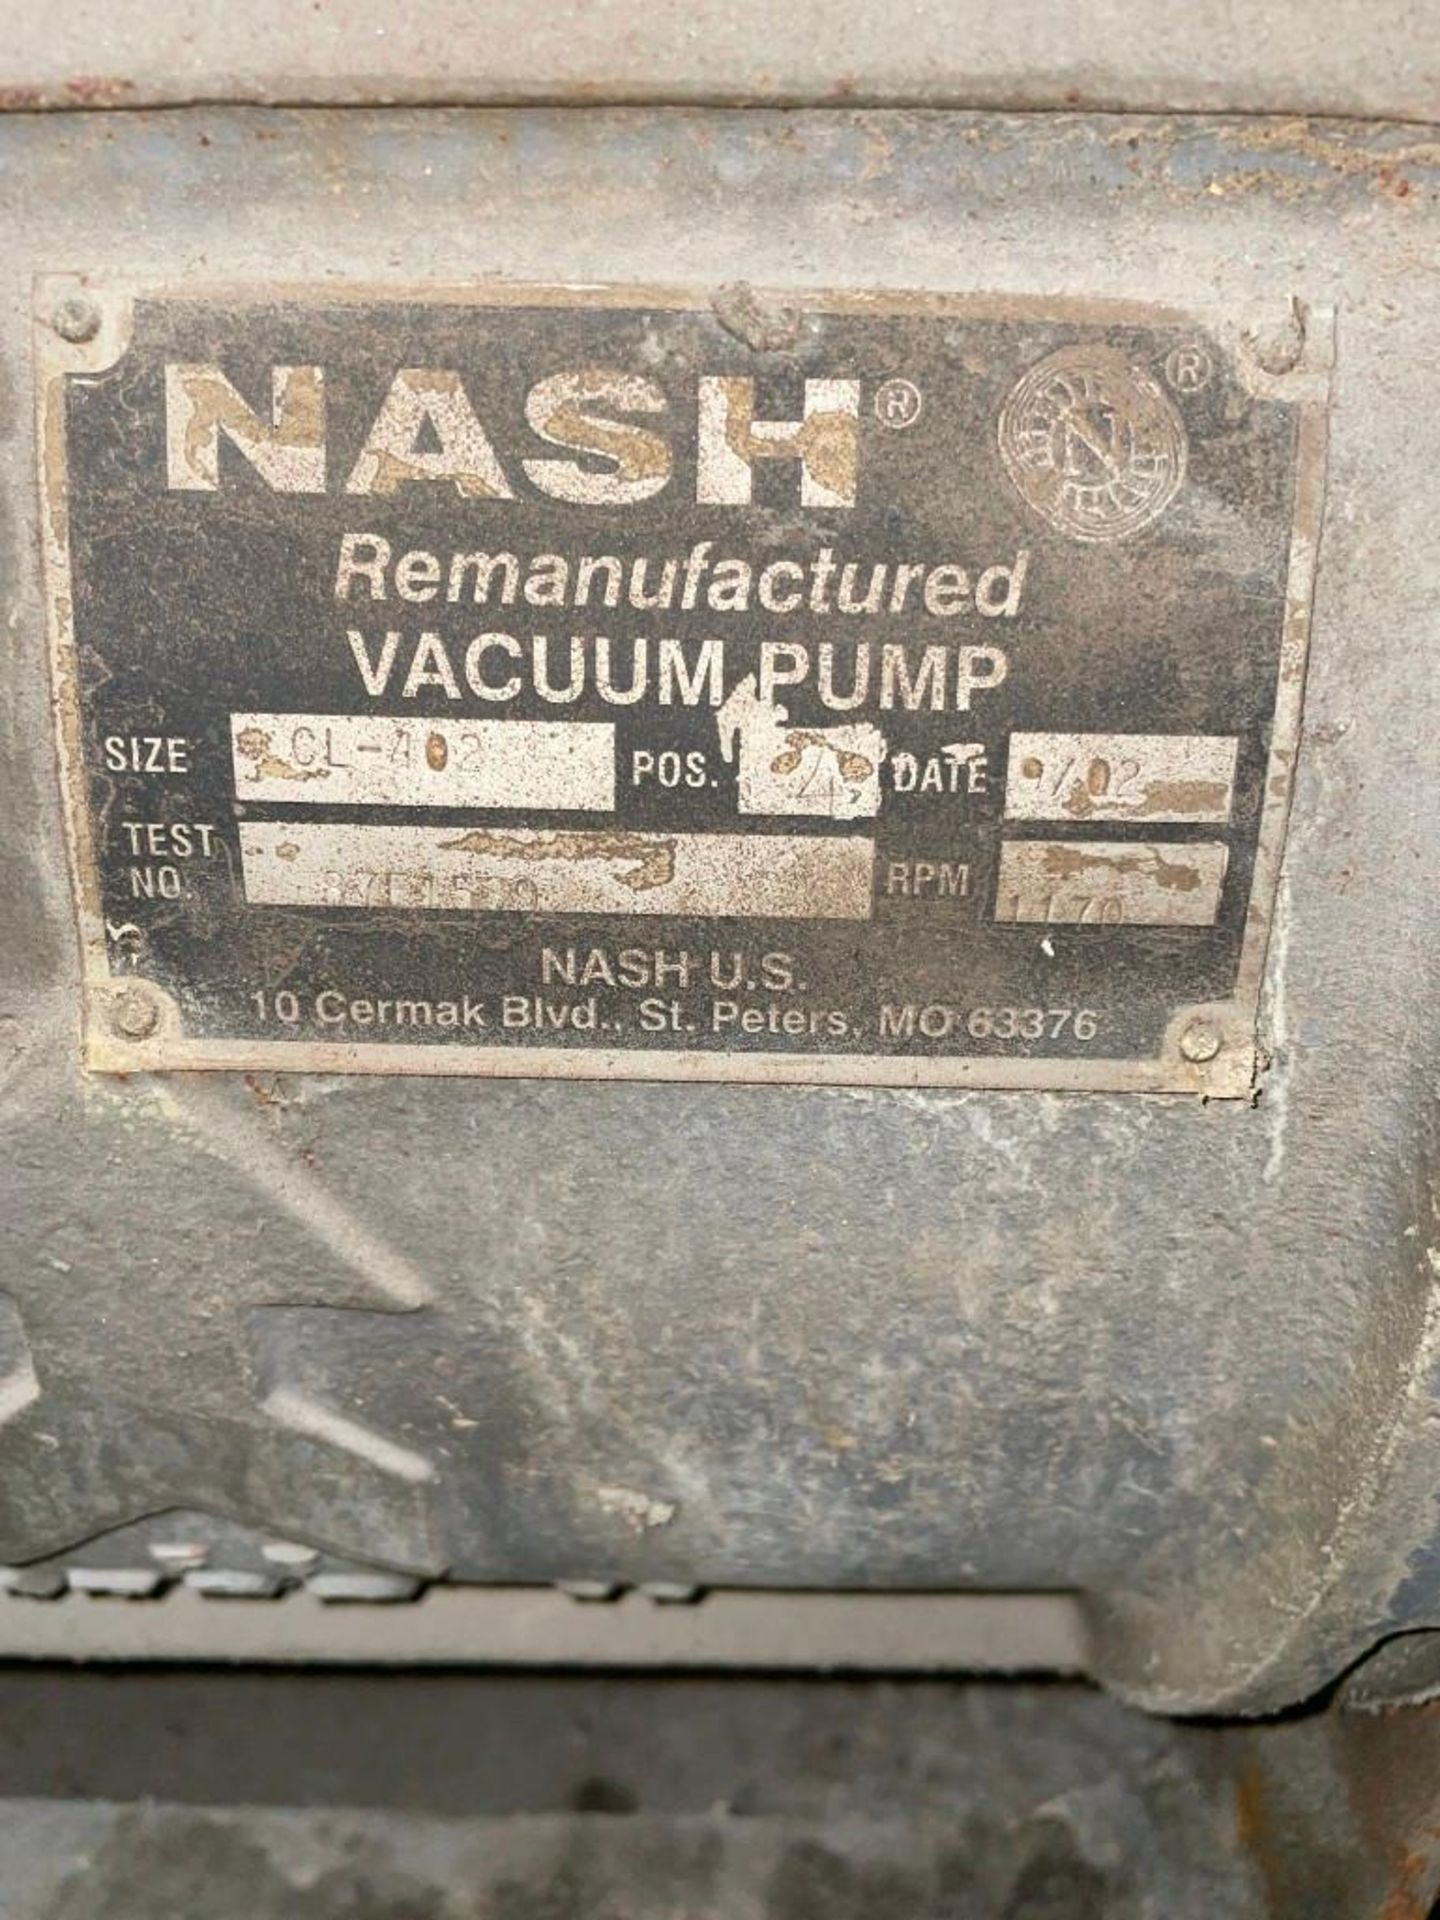 Nash CL-402 30 Horsepower Vacuum Pump - Image 6 of 6